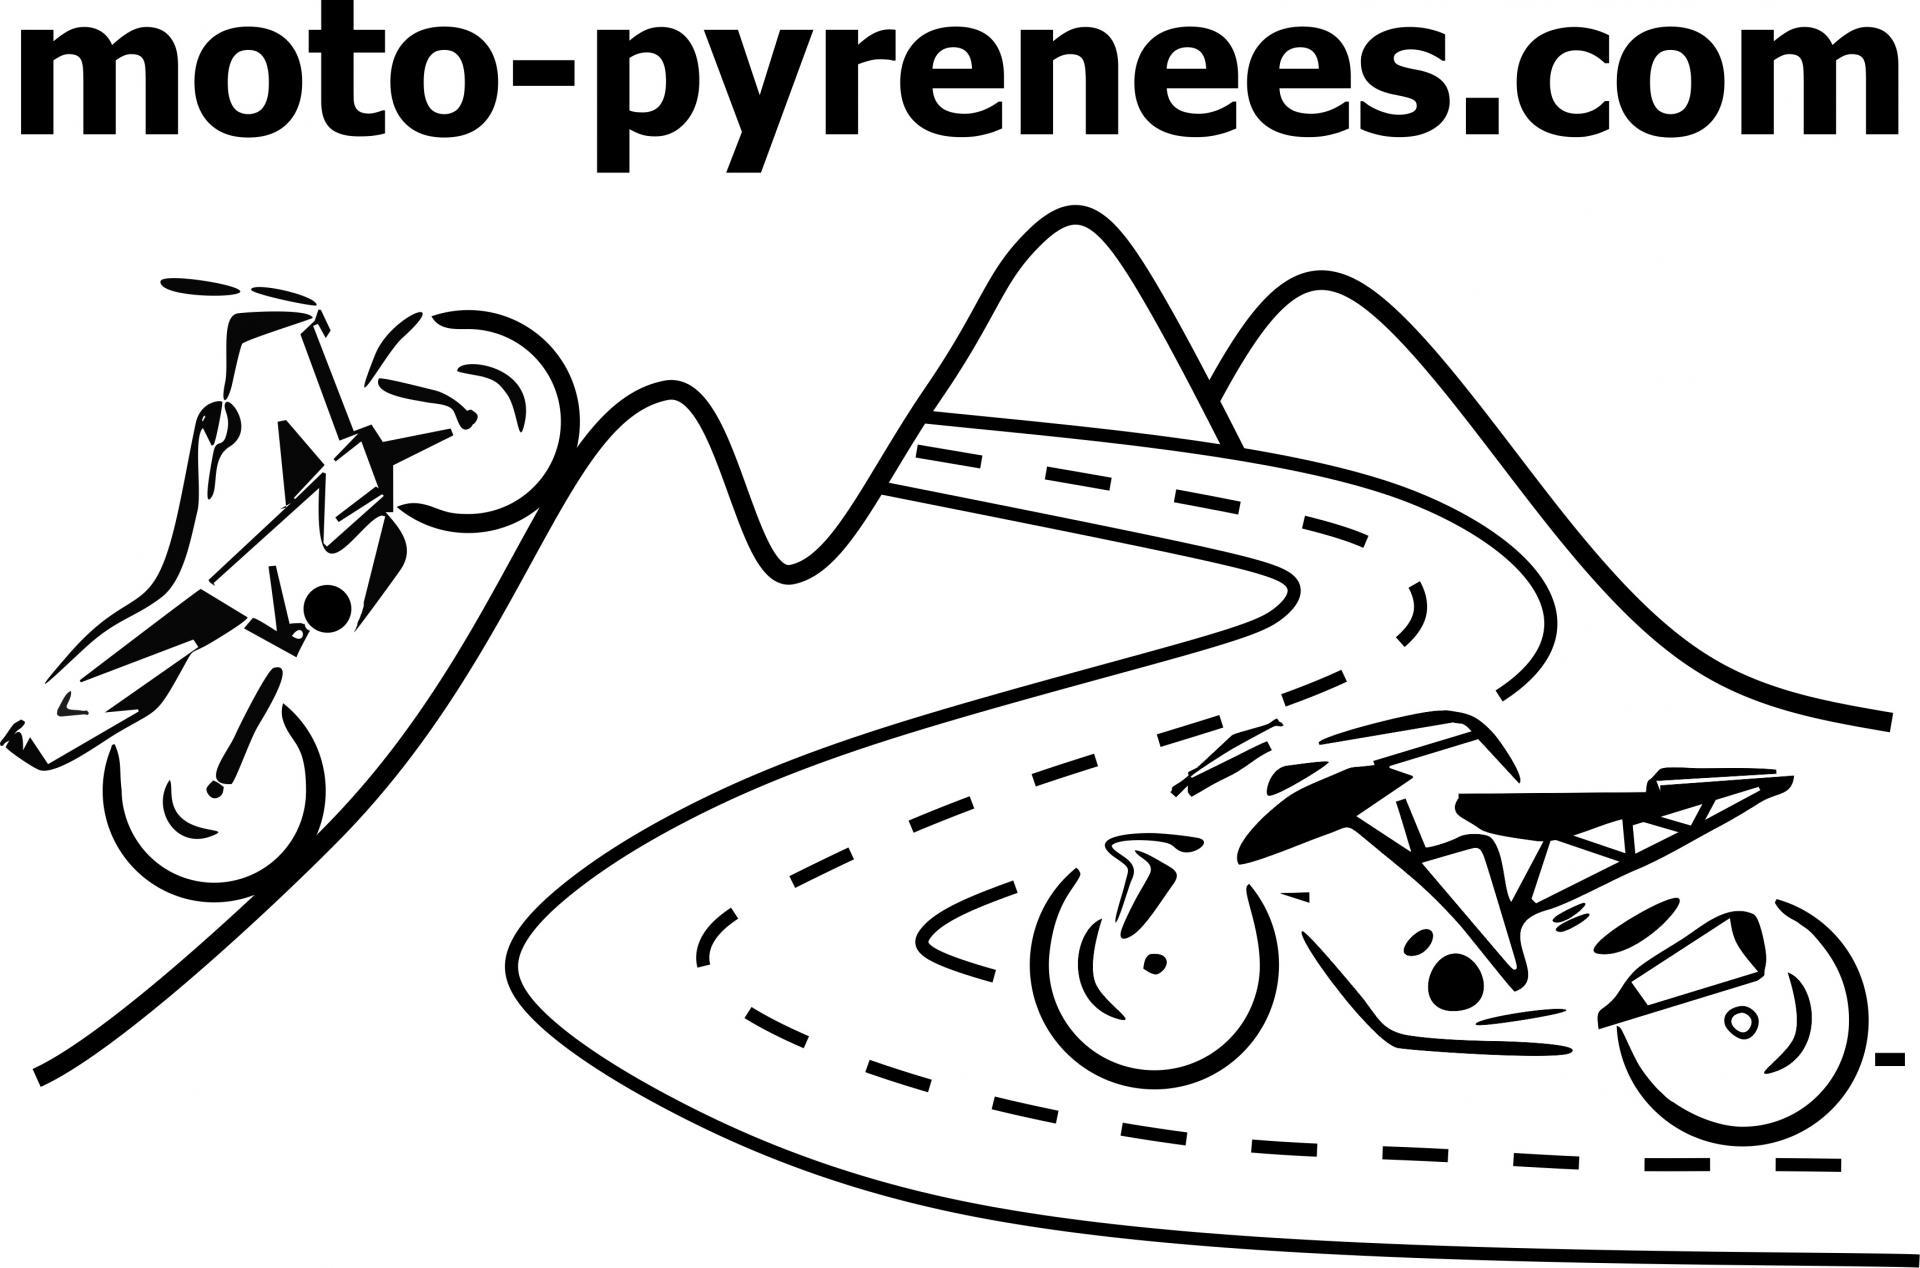 1 moto pyrenees balades voyage vacances logo 1